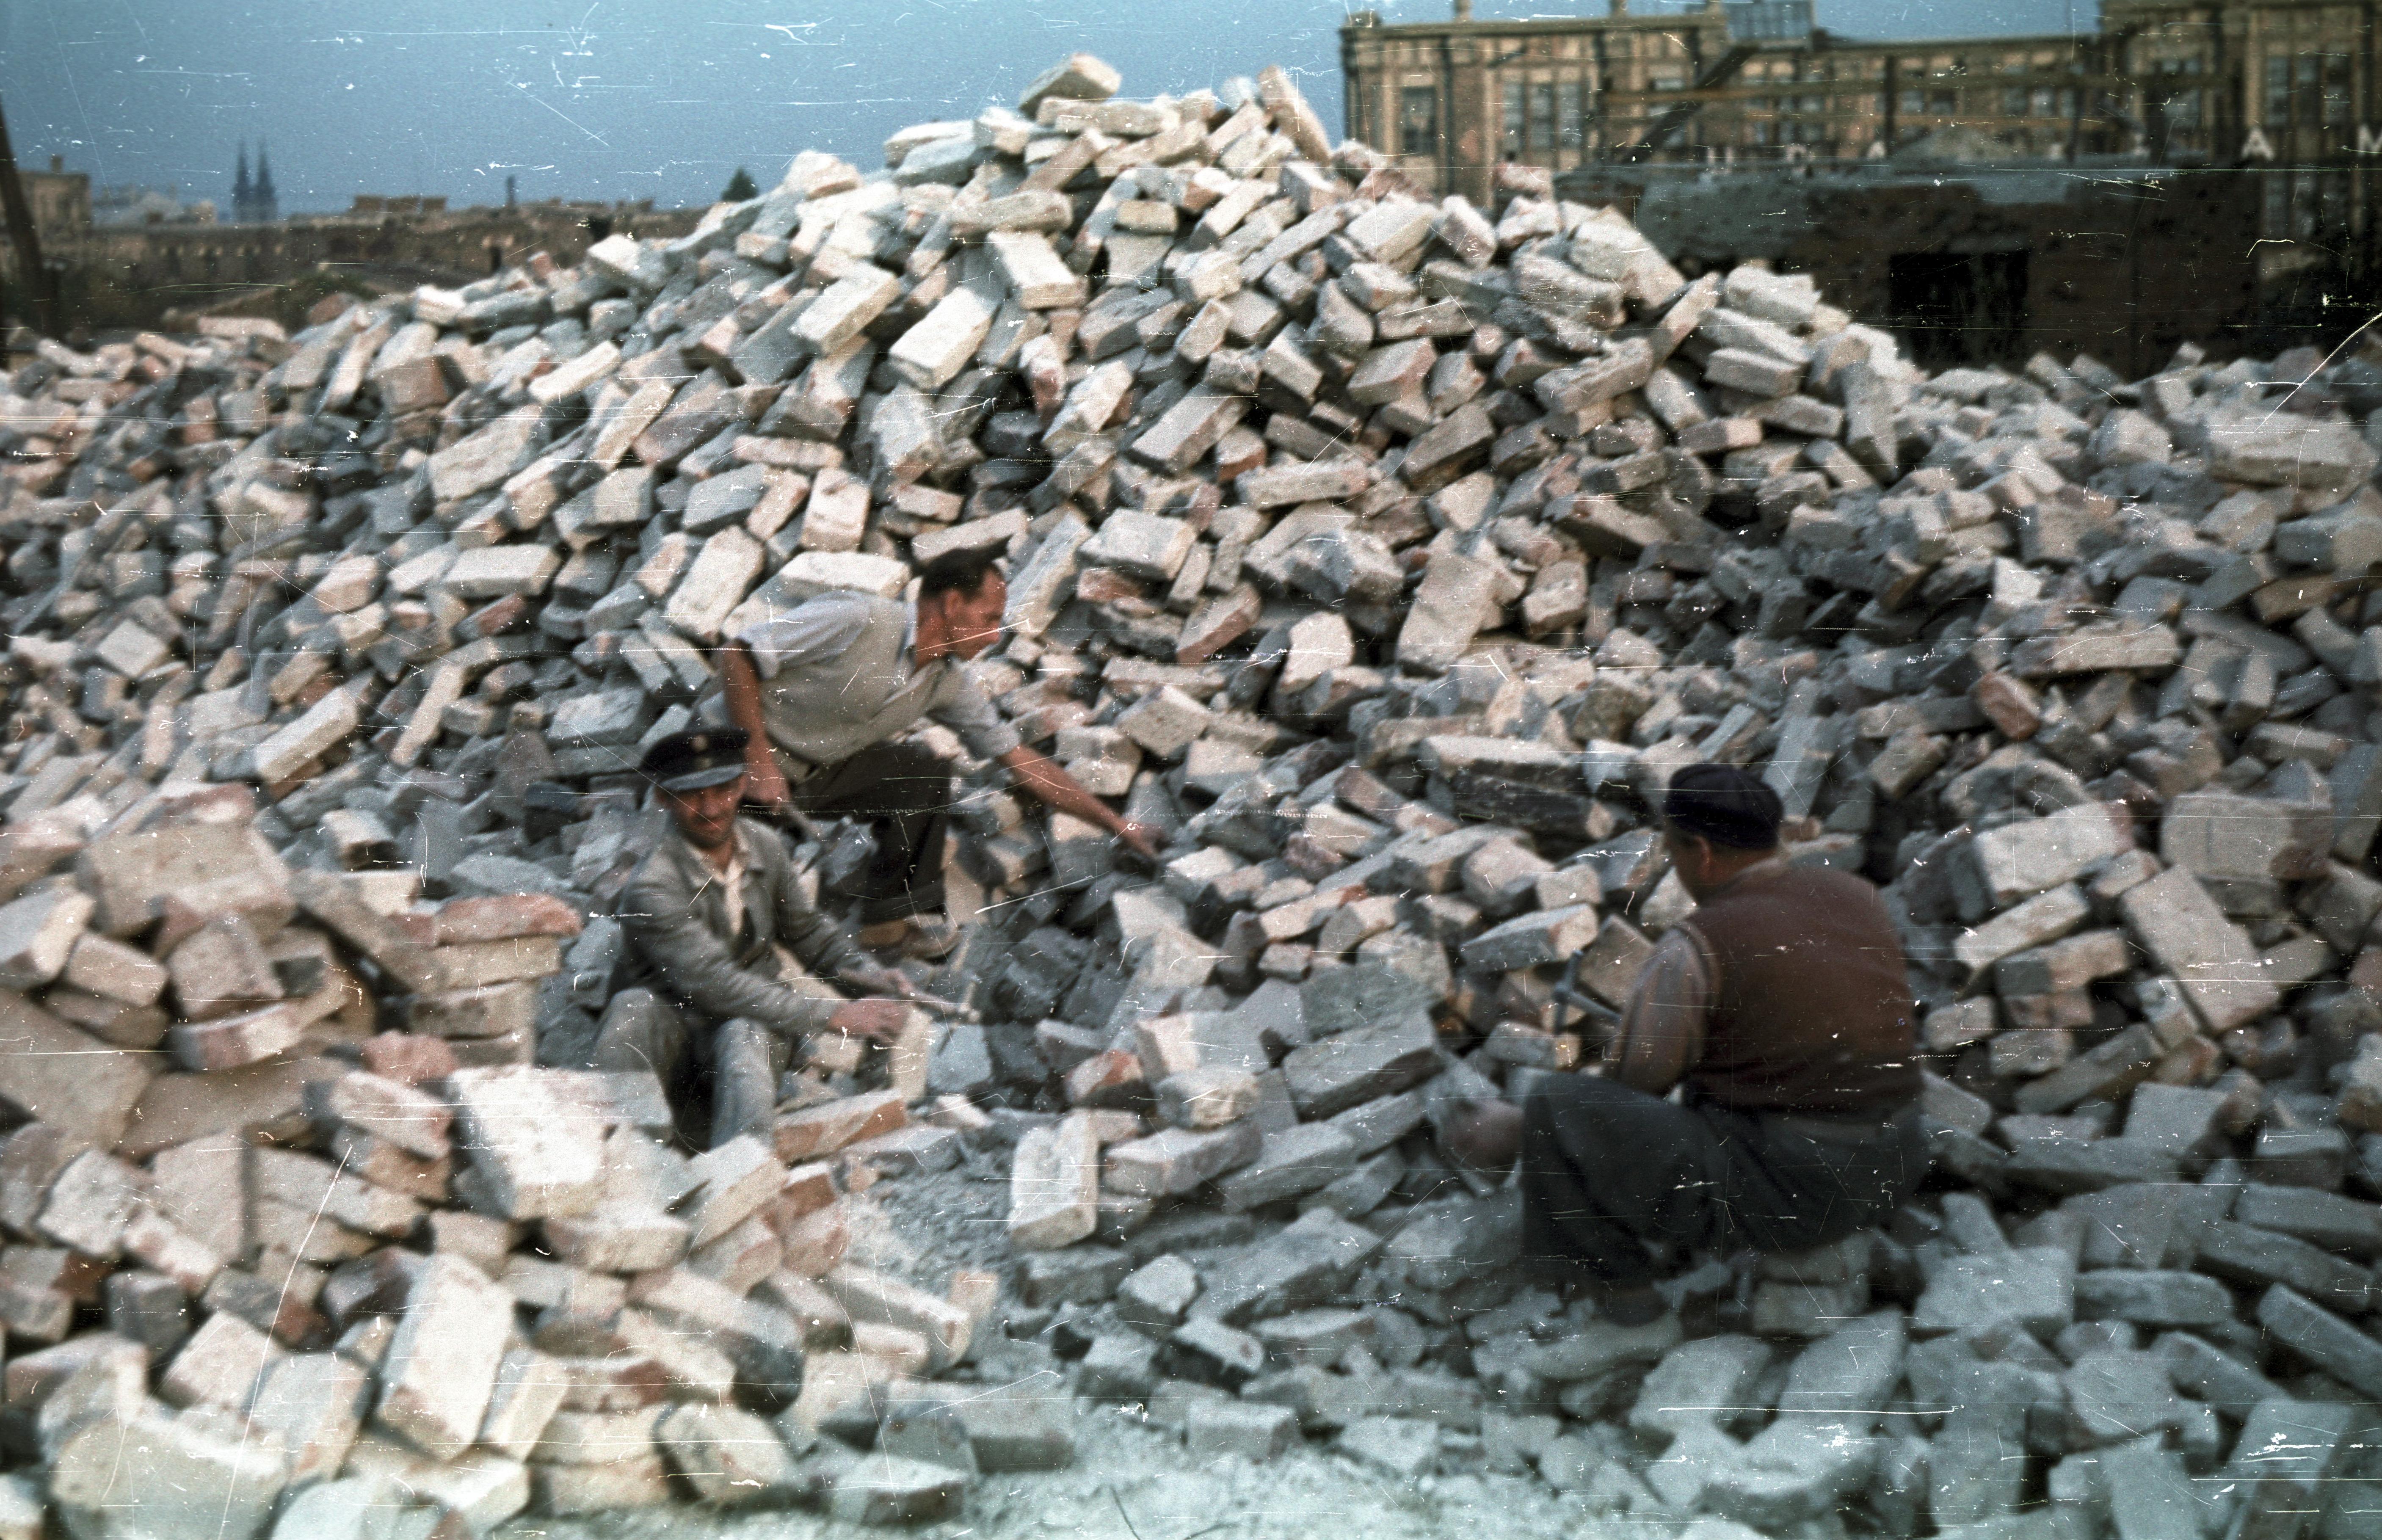 Уборка битого кирпича в районе между улицами Будаёрси и Фехерло